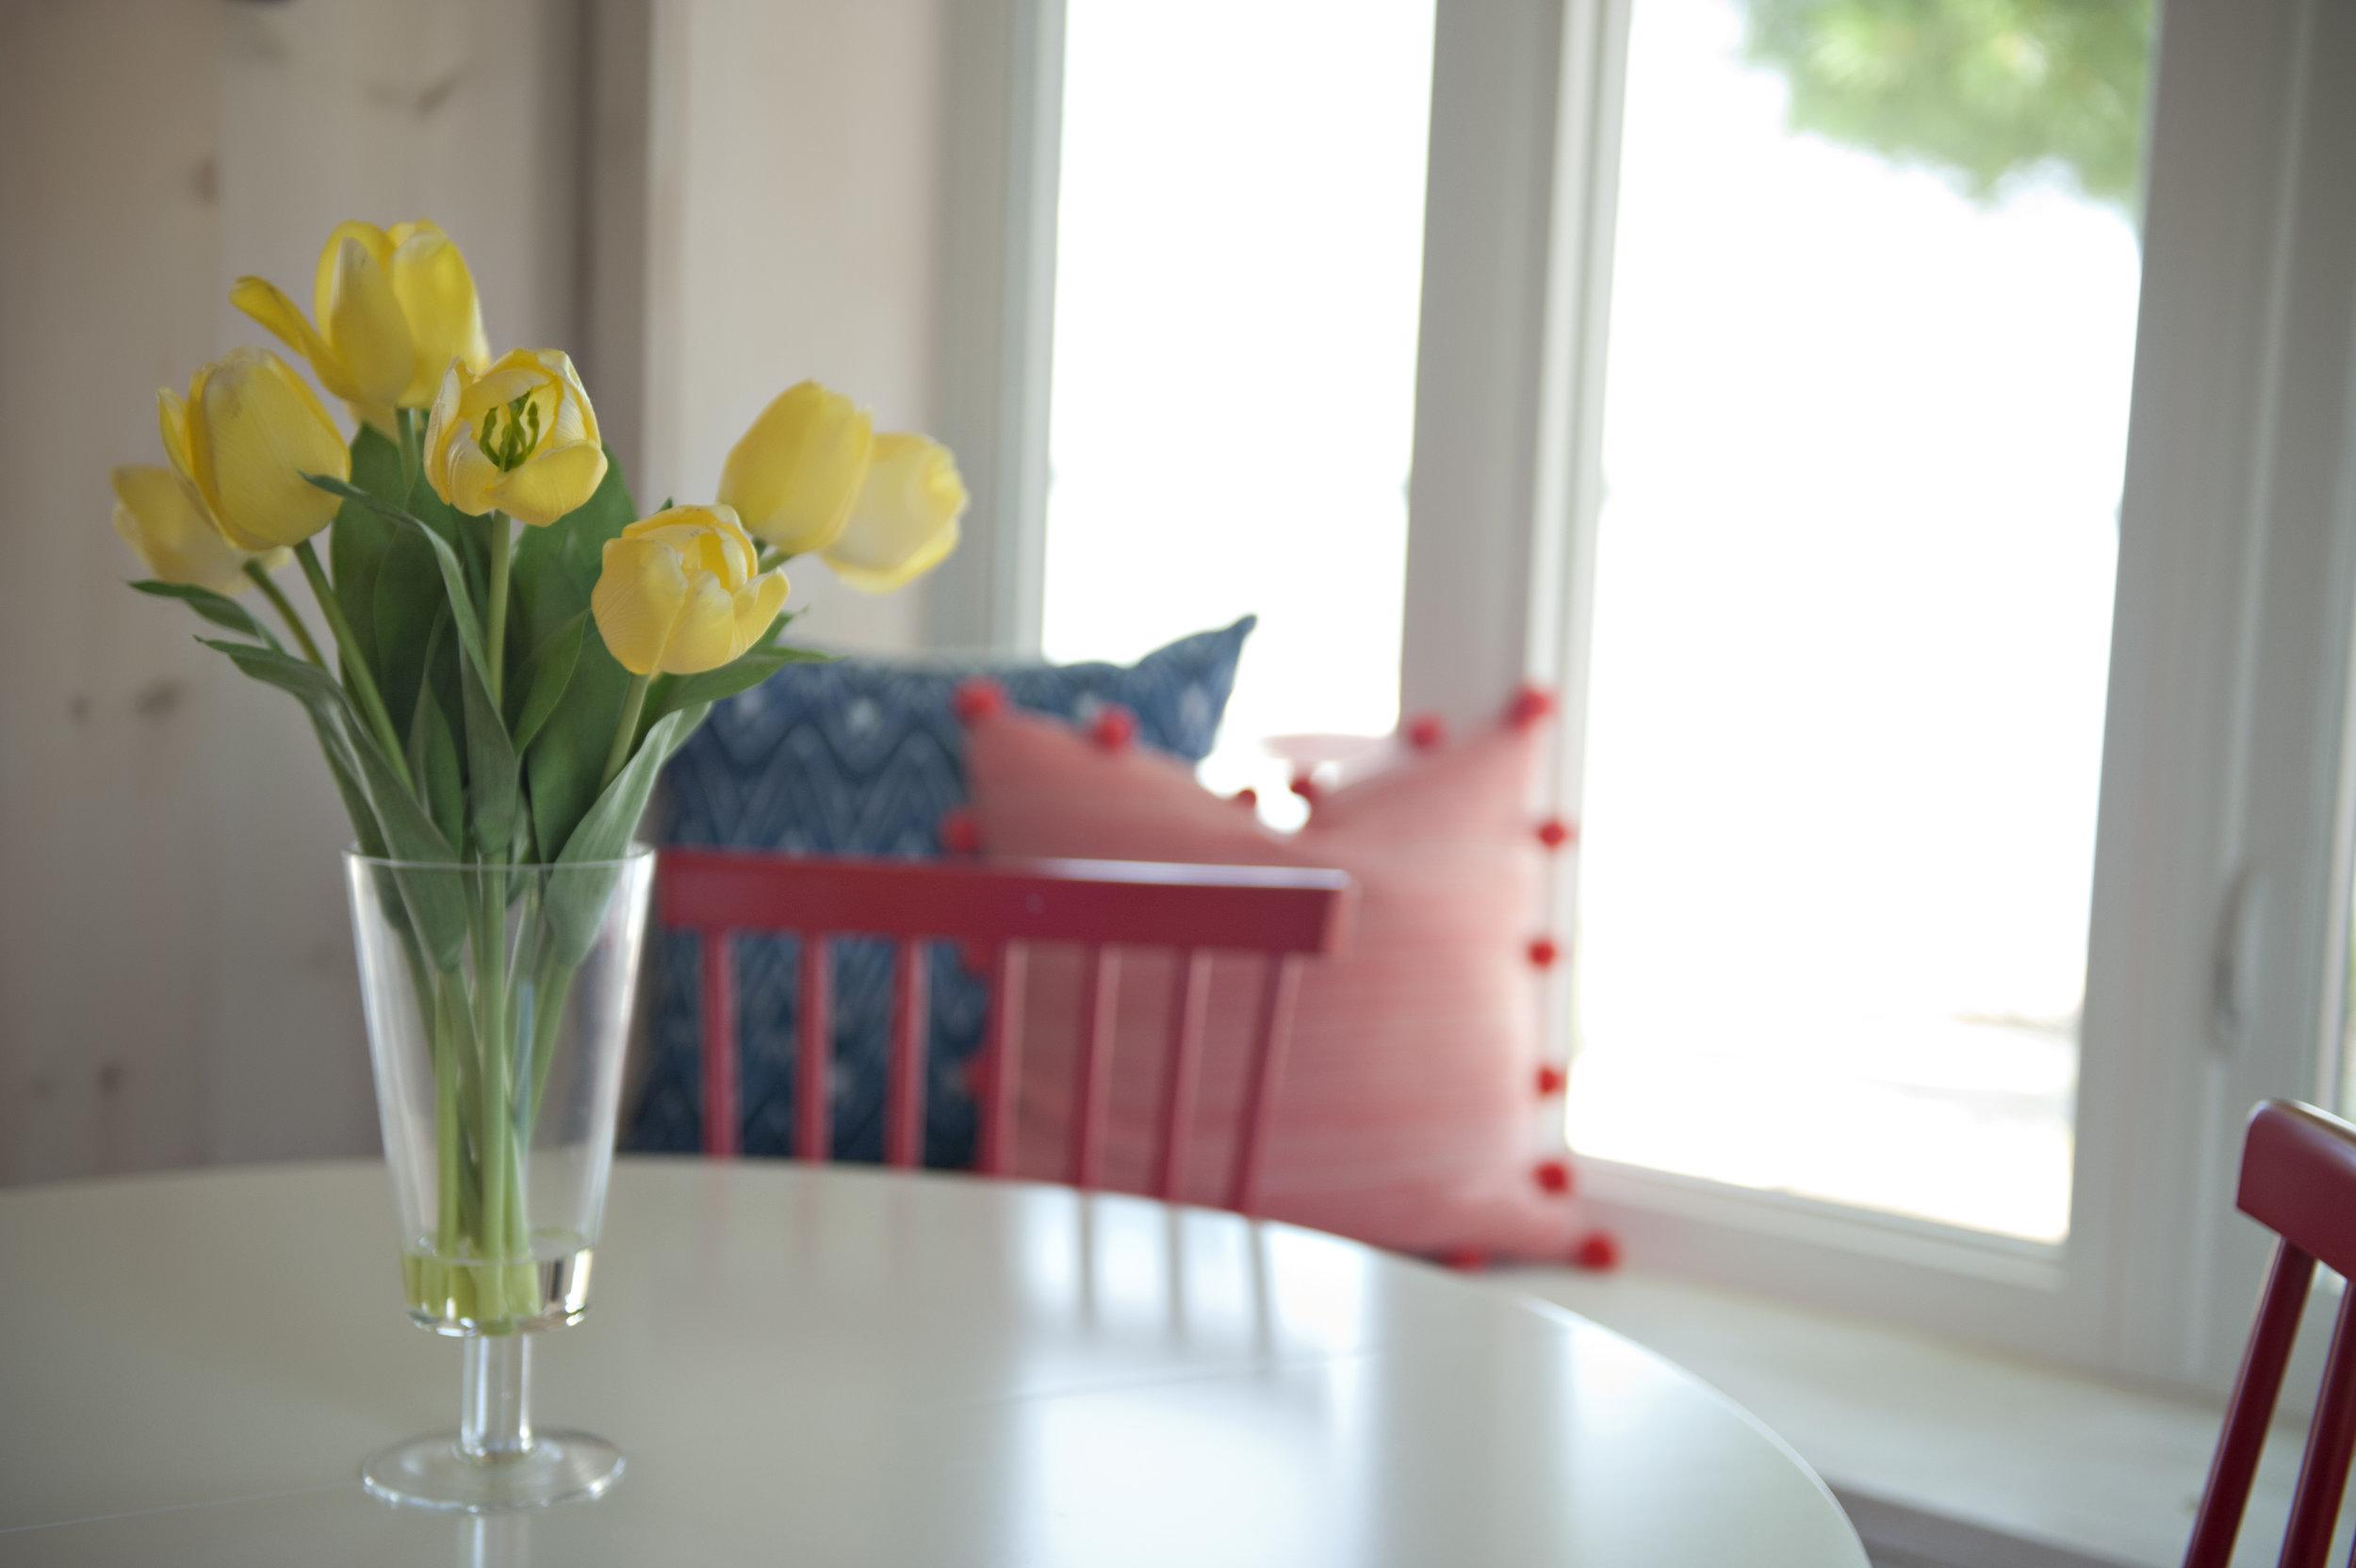 Candace-Plotz-Design-Beach-House-2-Tulips